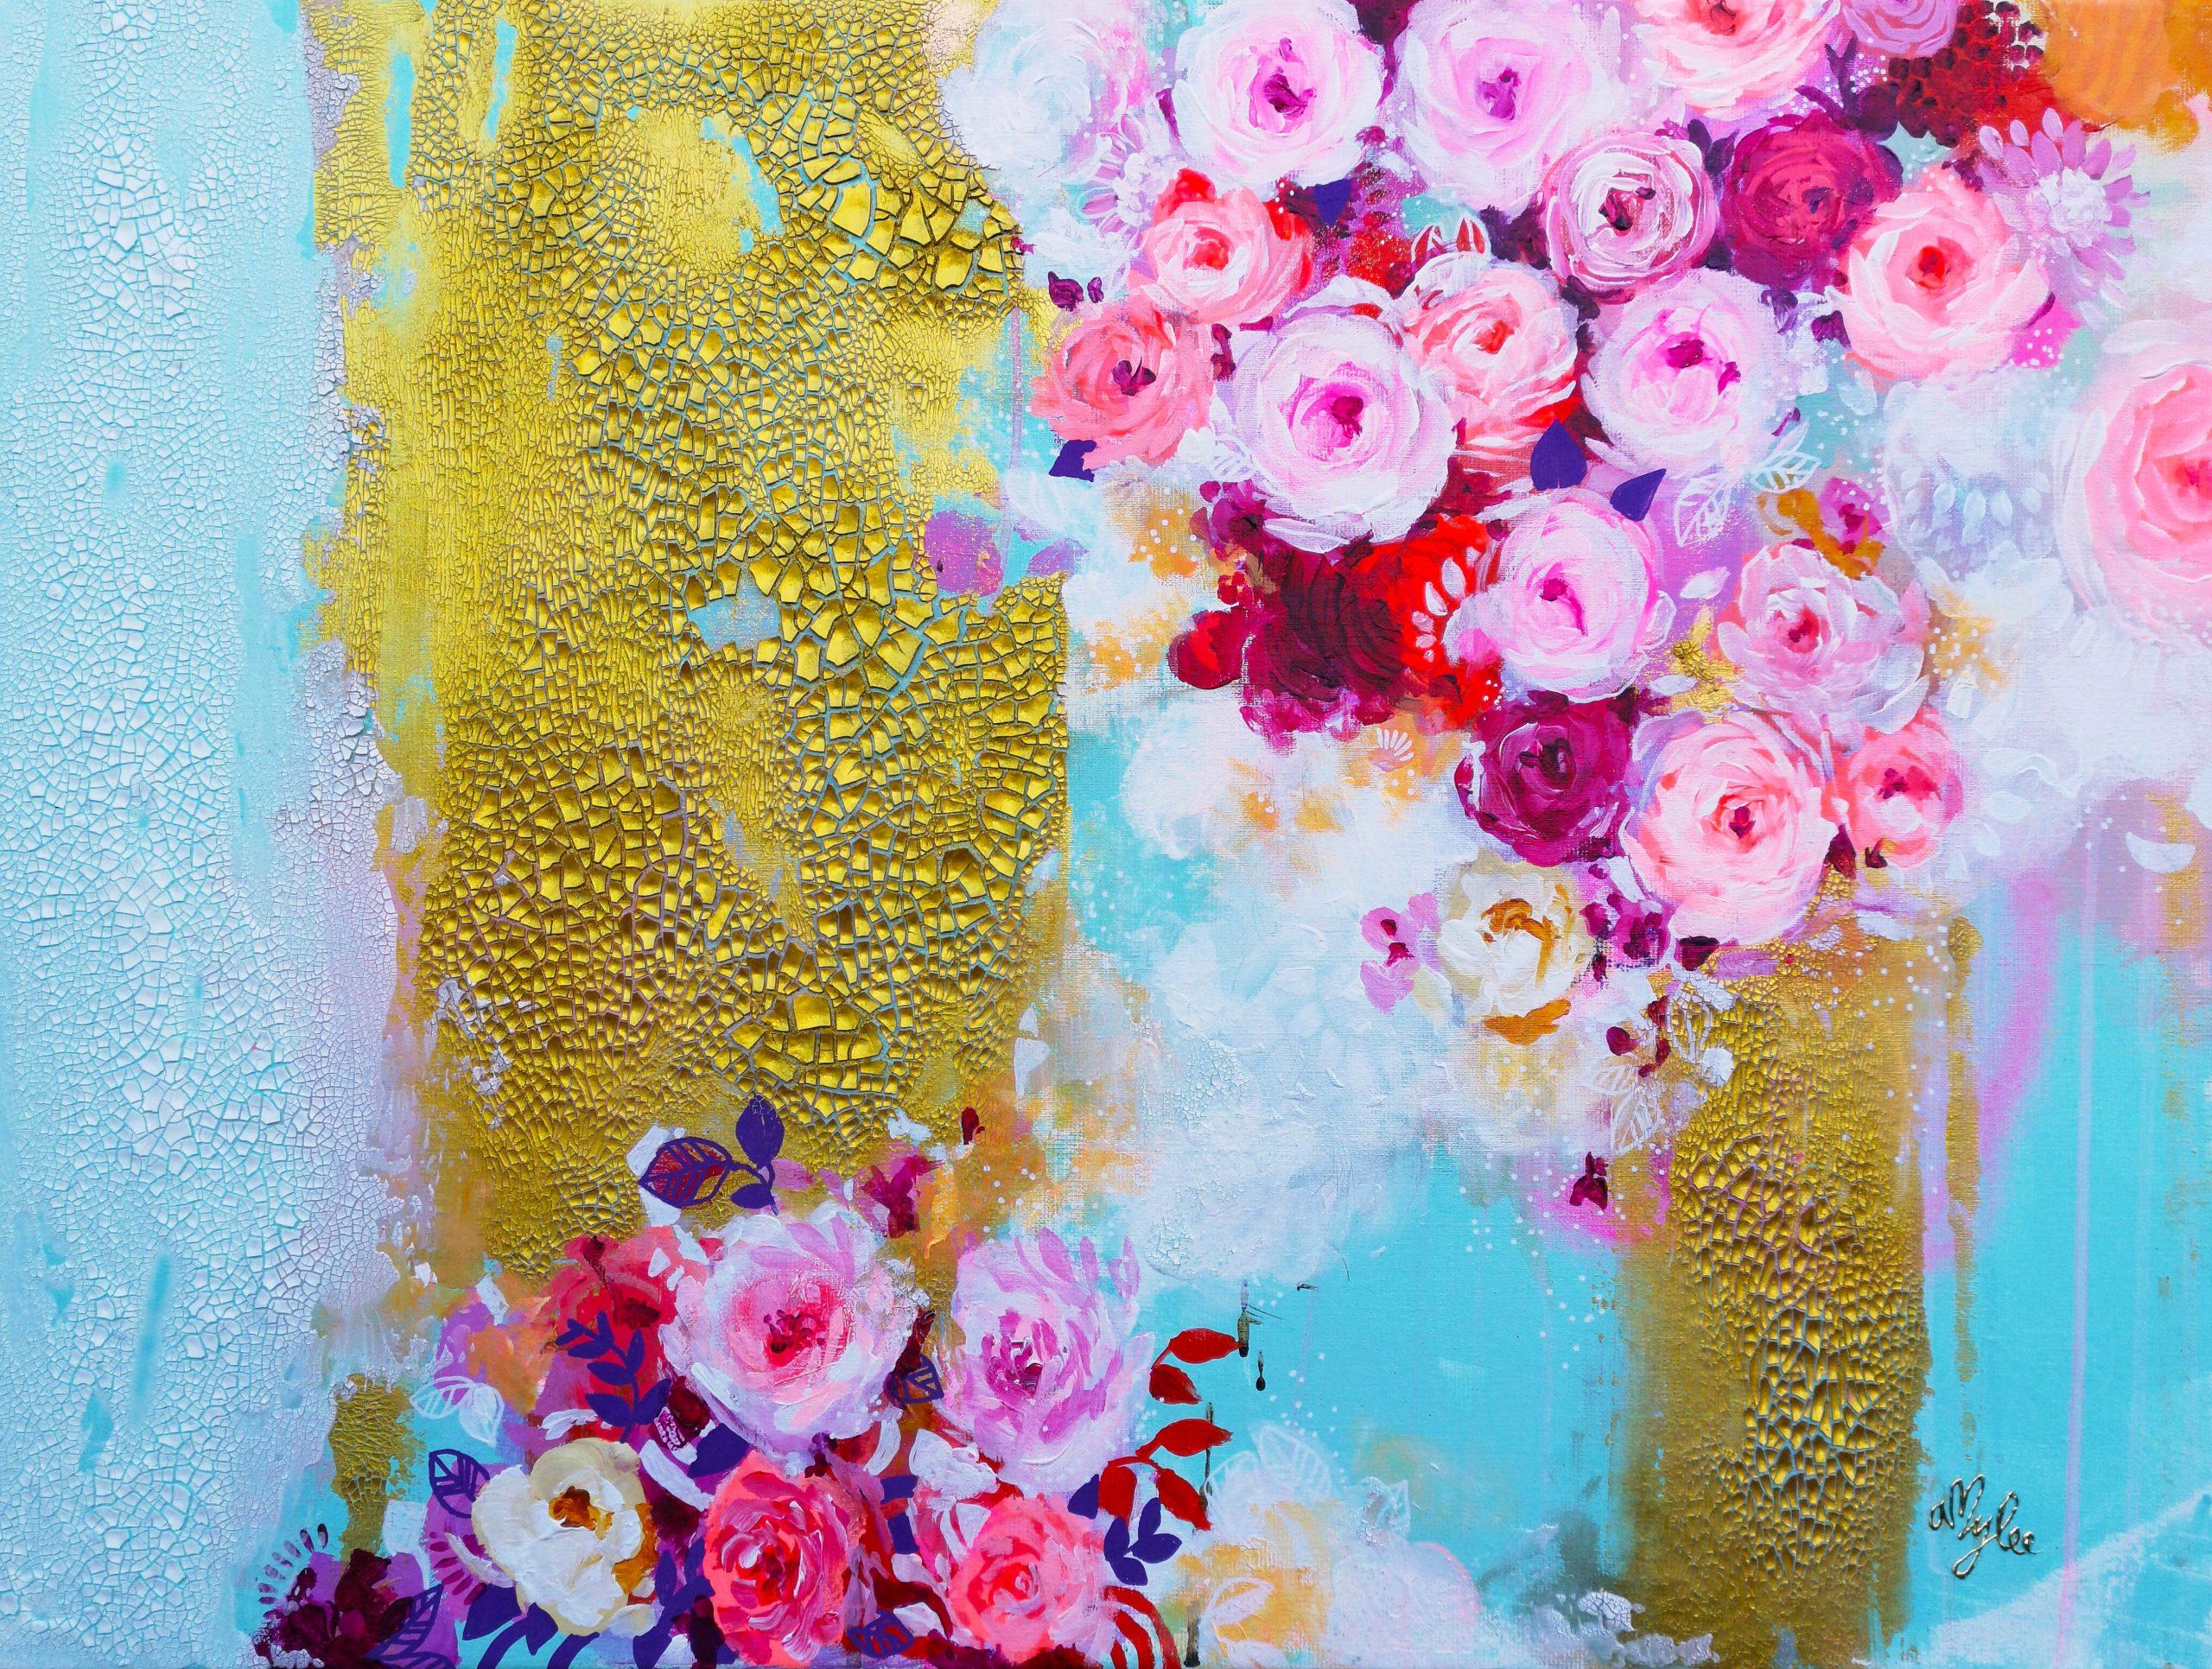 Flower Fountain - 80 x 60 cm